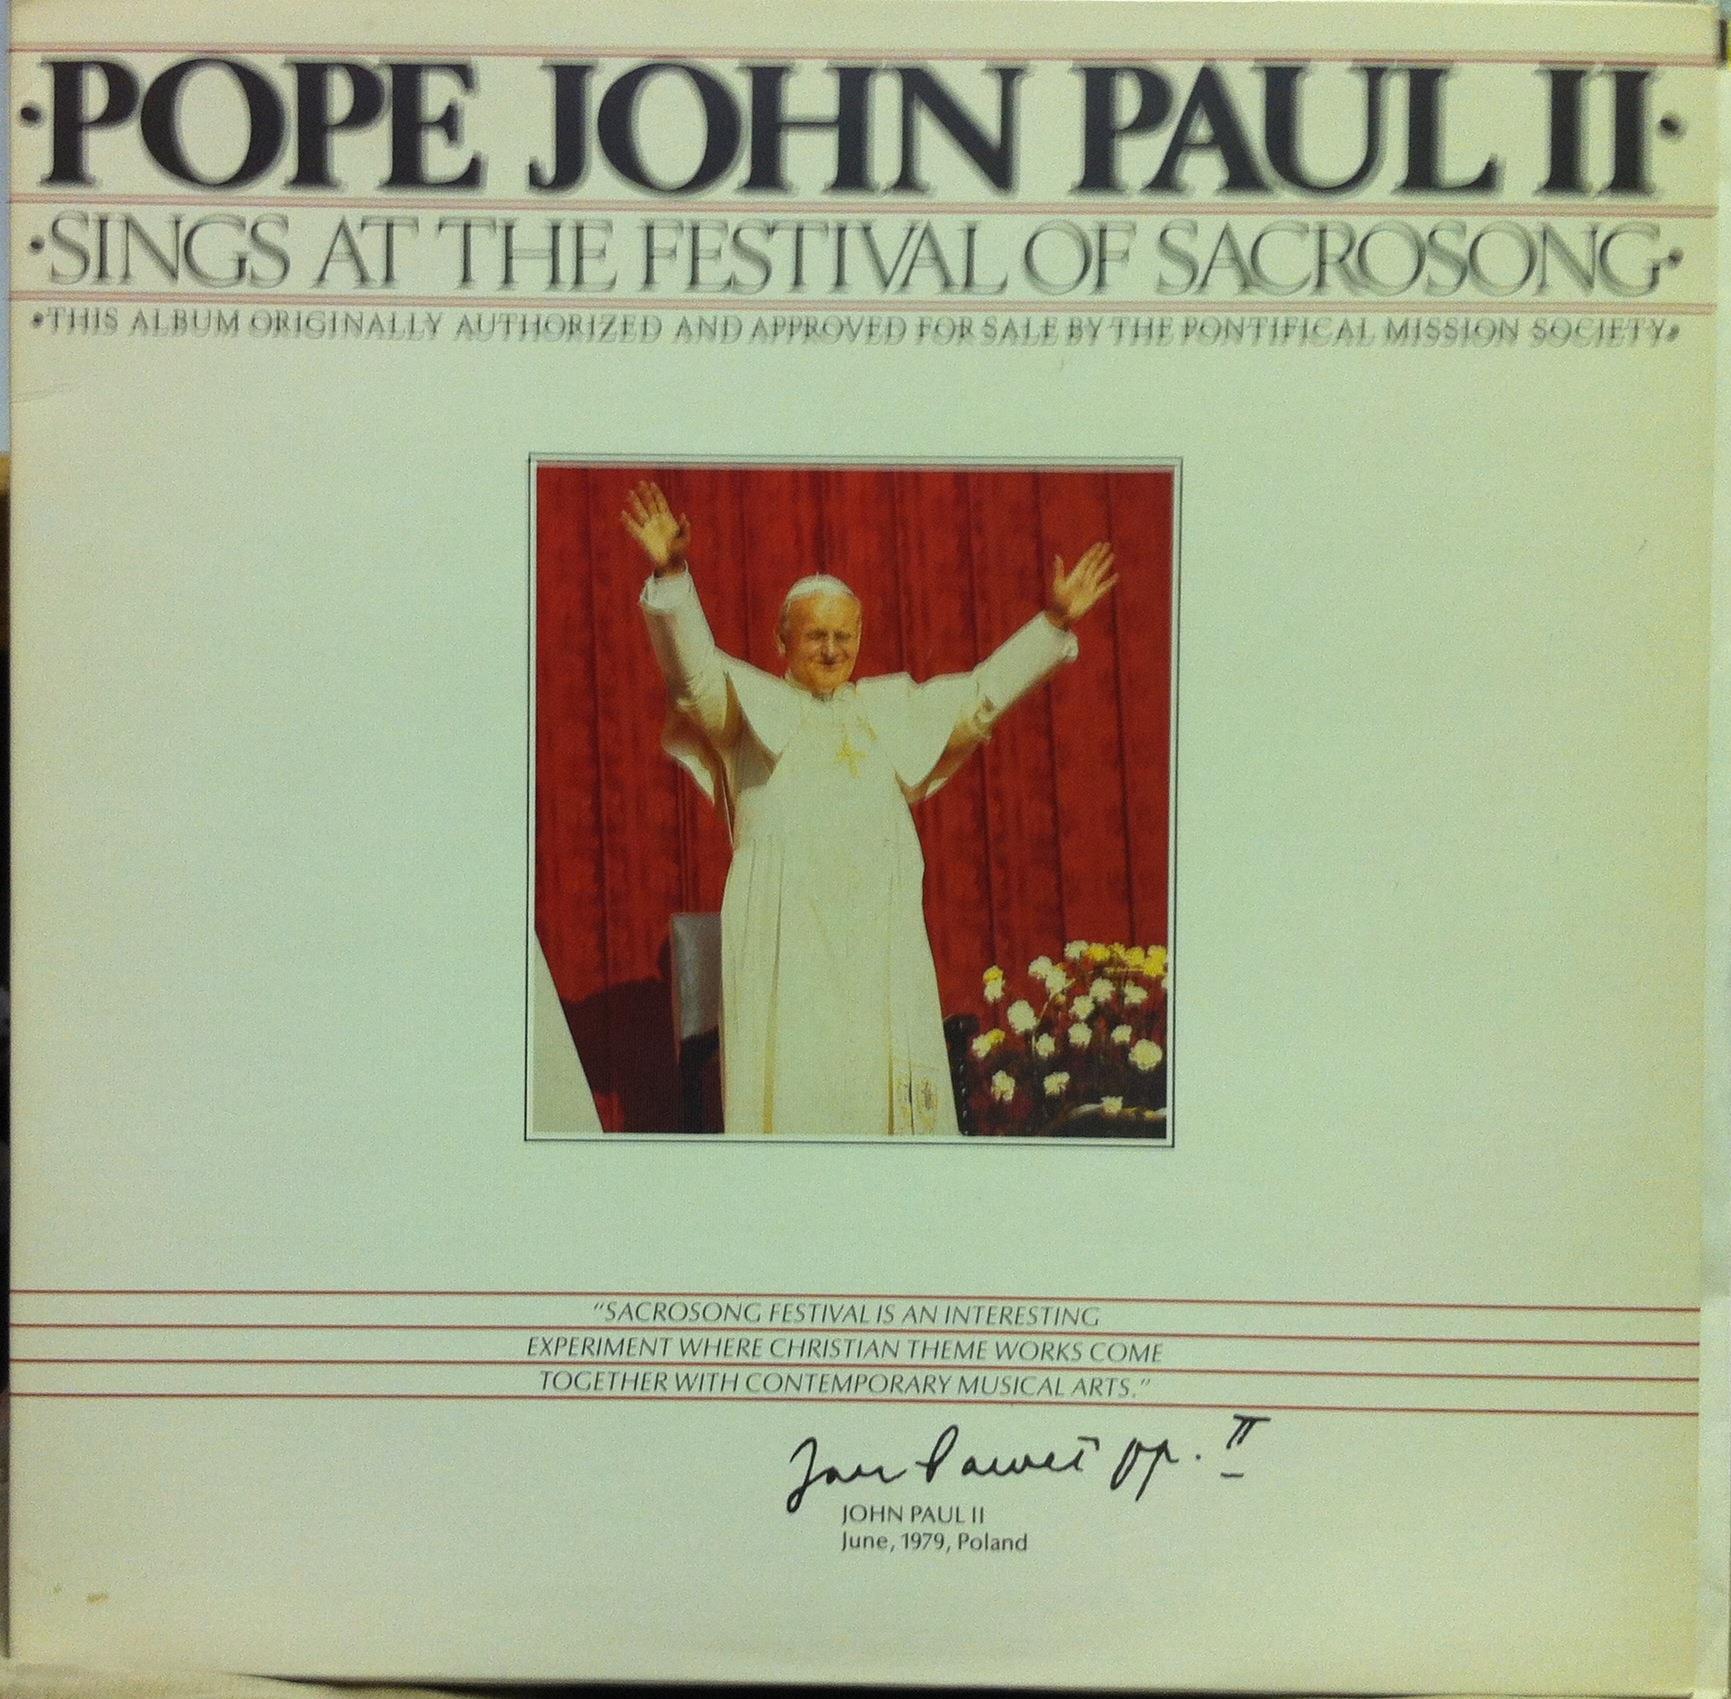 POPE JOHN PAUL II - Pope John Paul Ii Sings At The Festival Of Sacrosong Lp Vg+ Inf 9899 Vinyl 1979 (sings At The Festiv